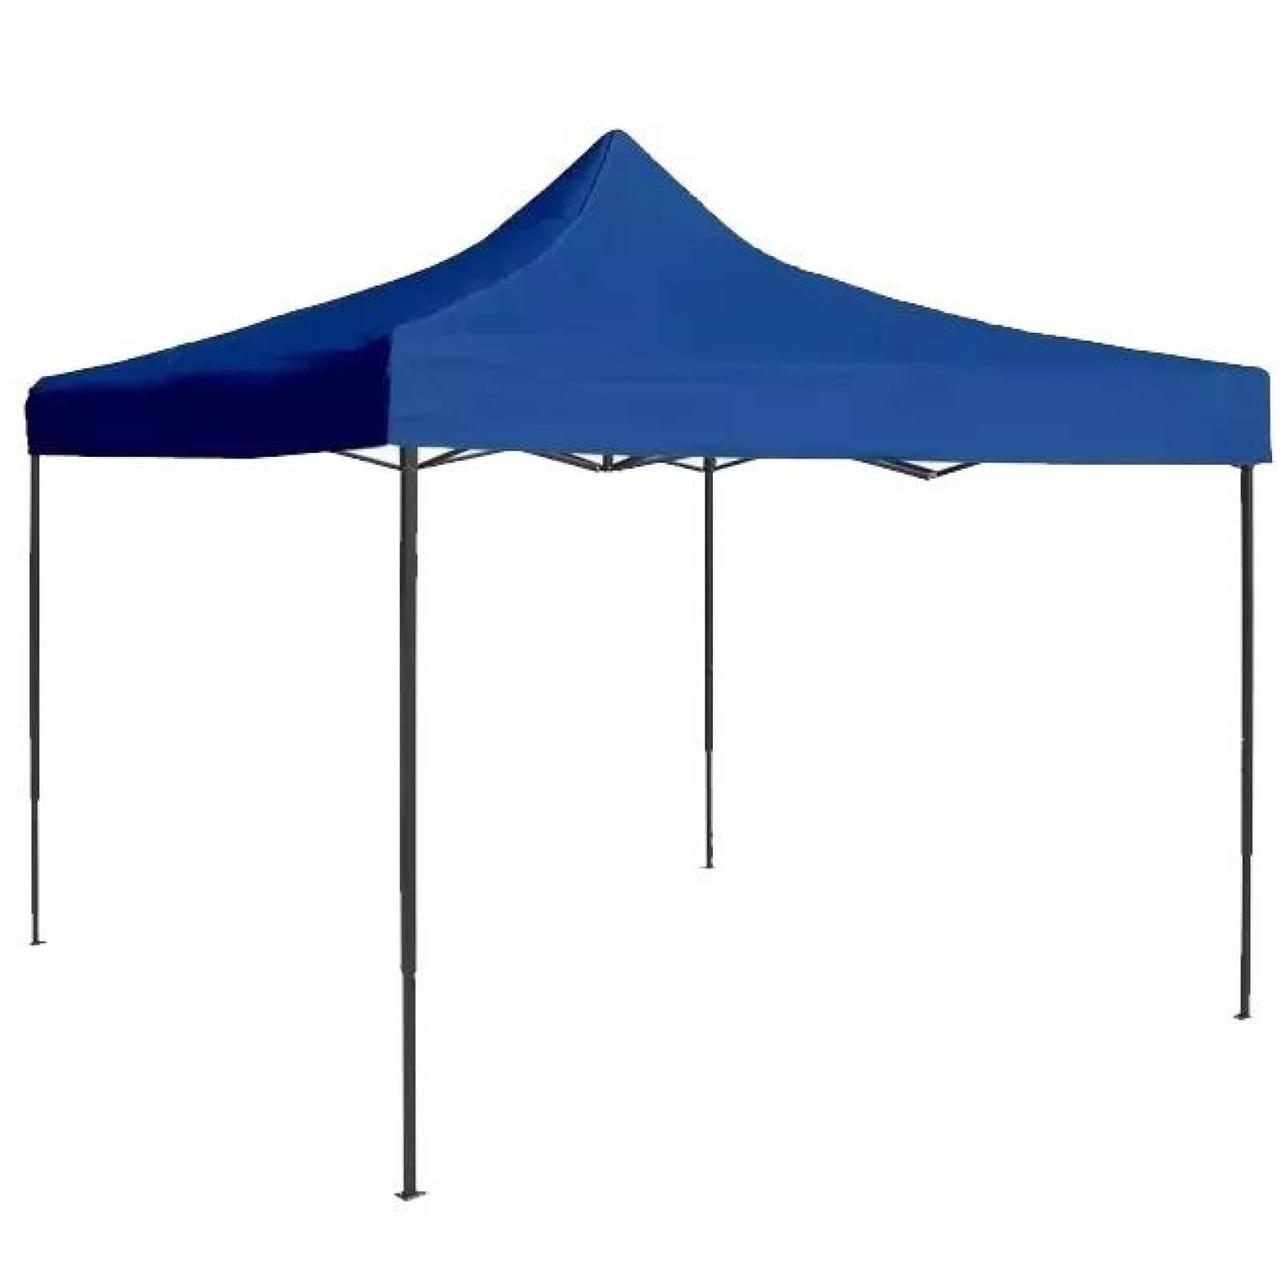 Шатер раздвижной гармошка, палатка, тент 3*4,5 м Синий павильйон, навес